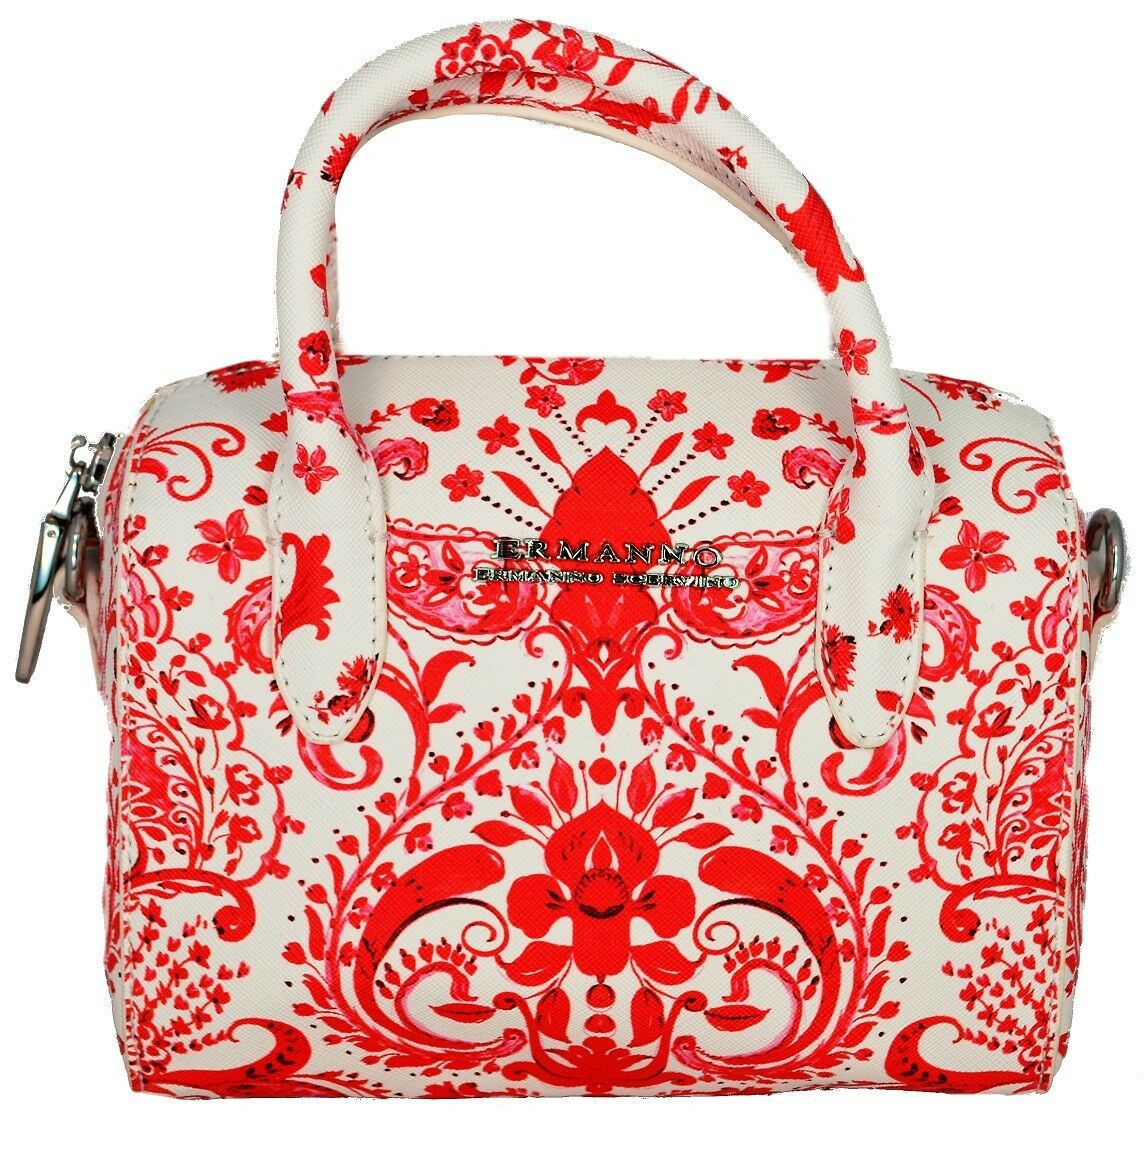 Tasche Handtasche Tasche Frau Koralle Ermanno Scervino Bag Frau Orange Linea Co